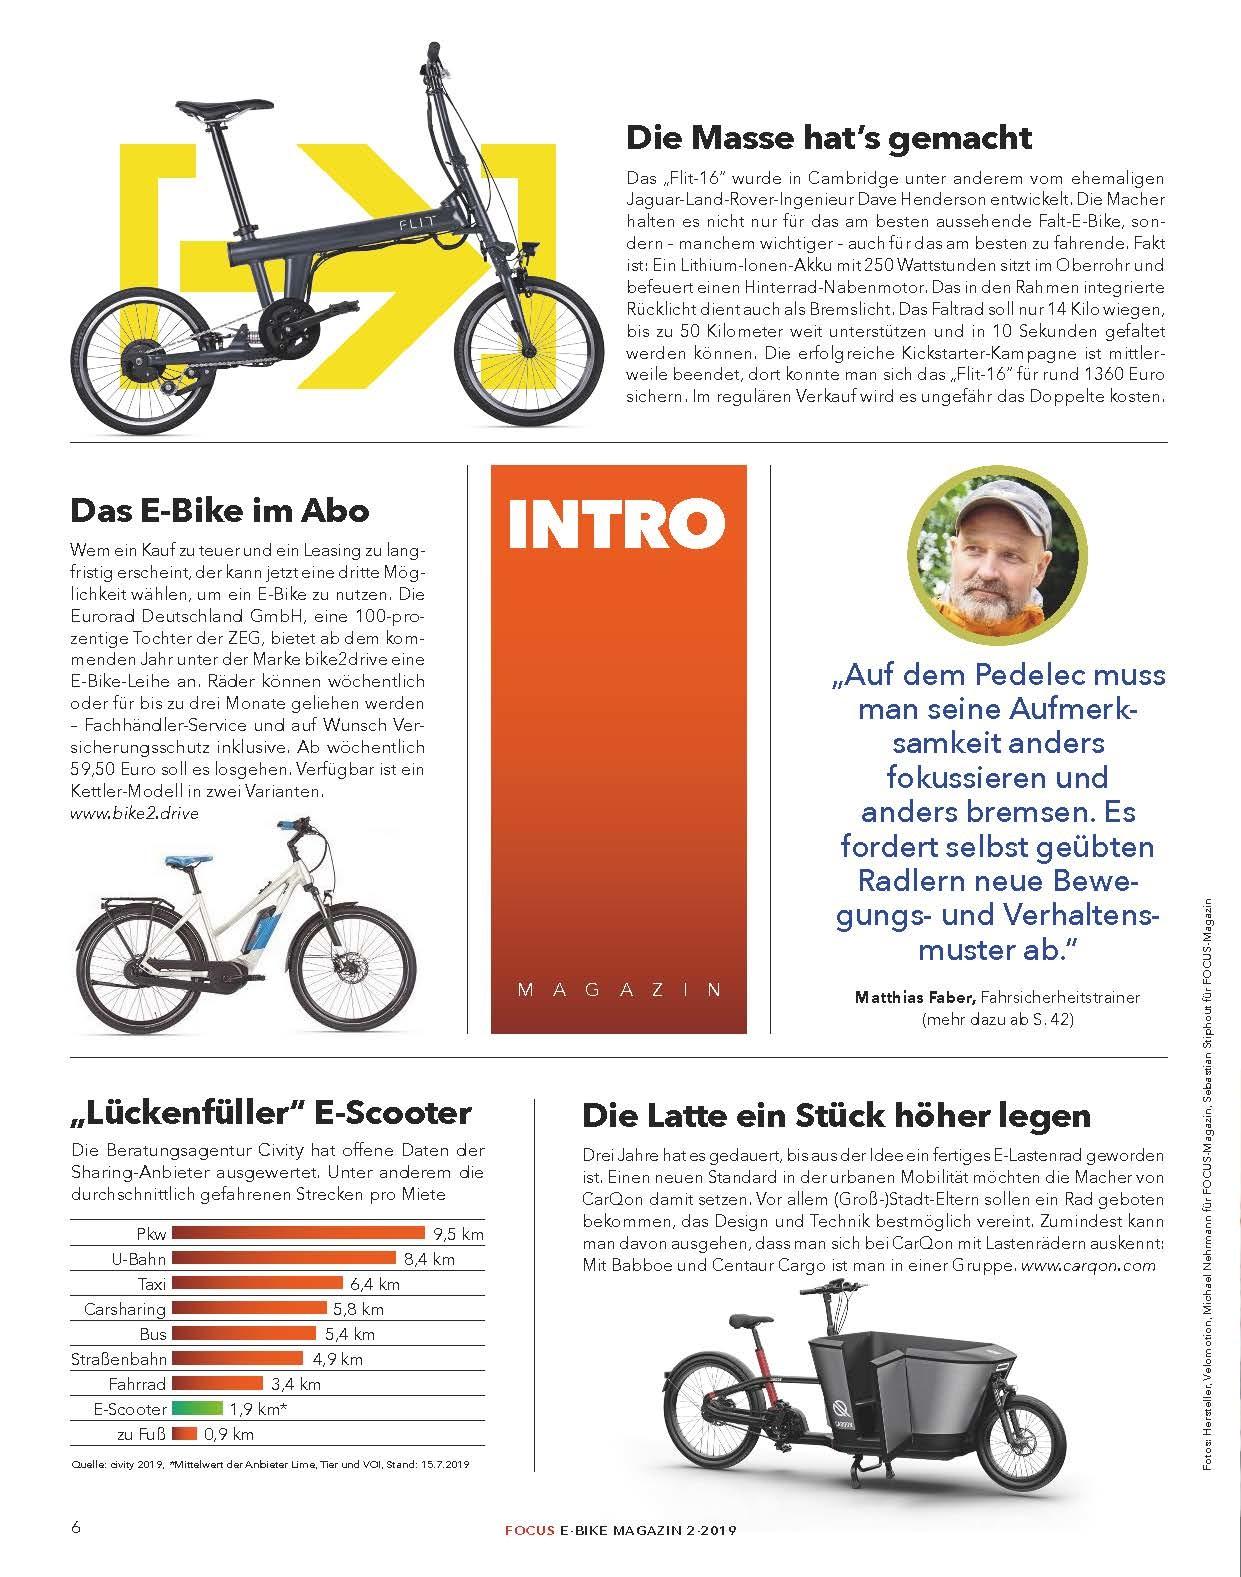 FOCUS Magazin FOCUS E-Bike 02/2019